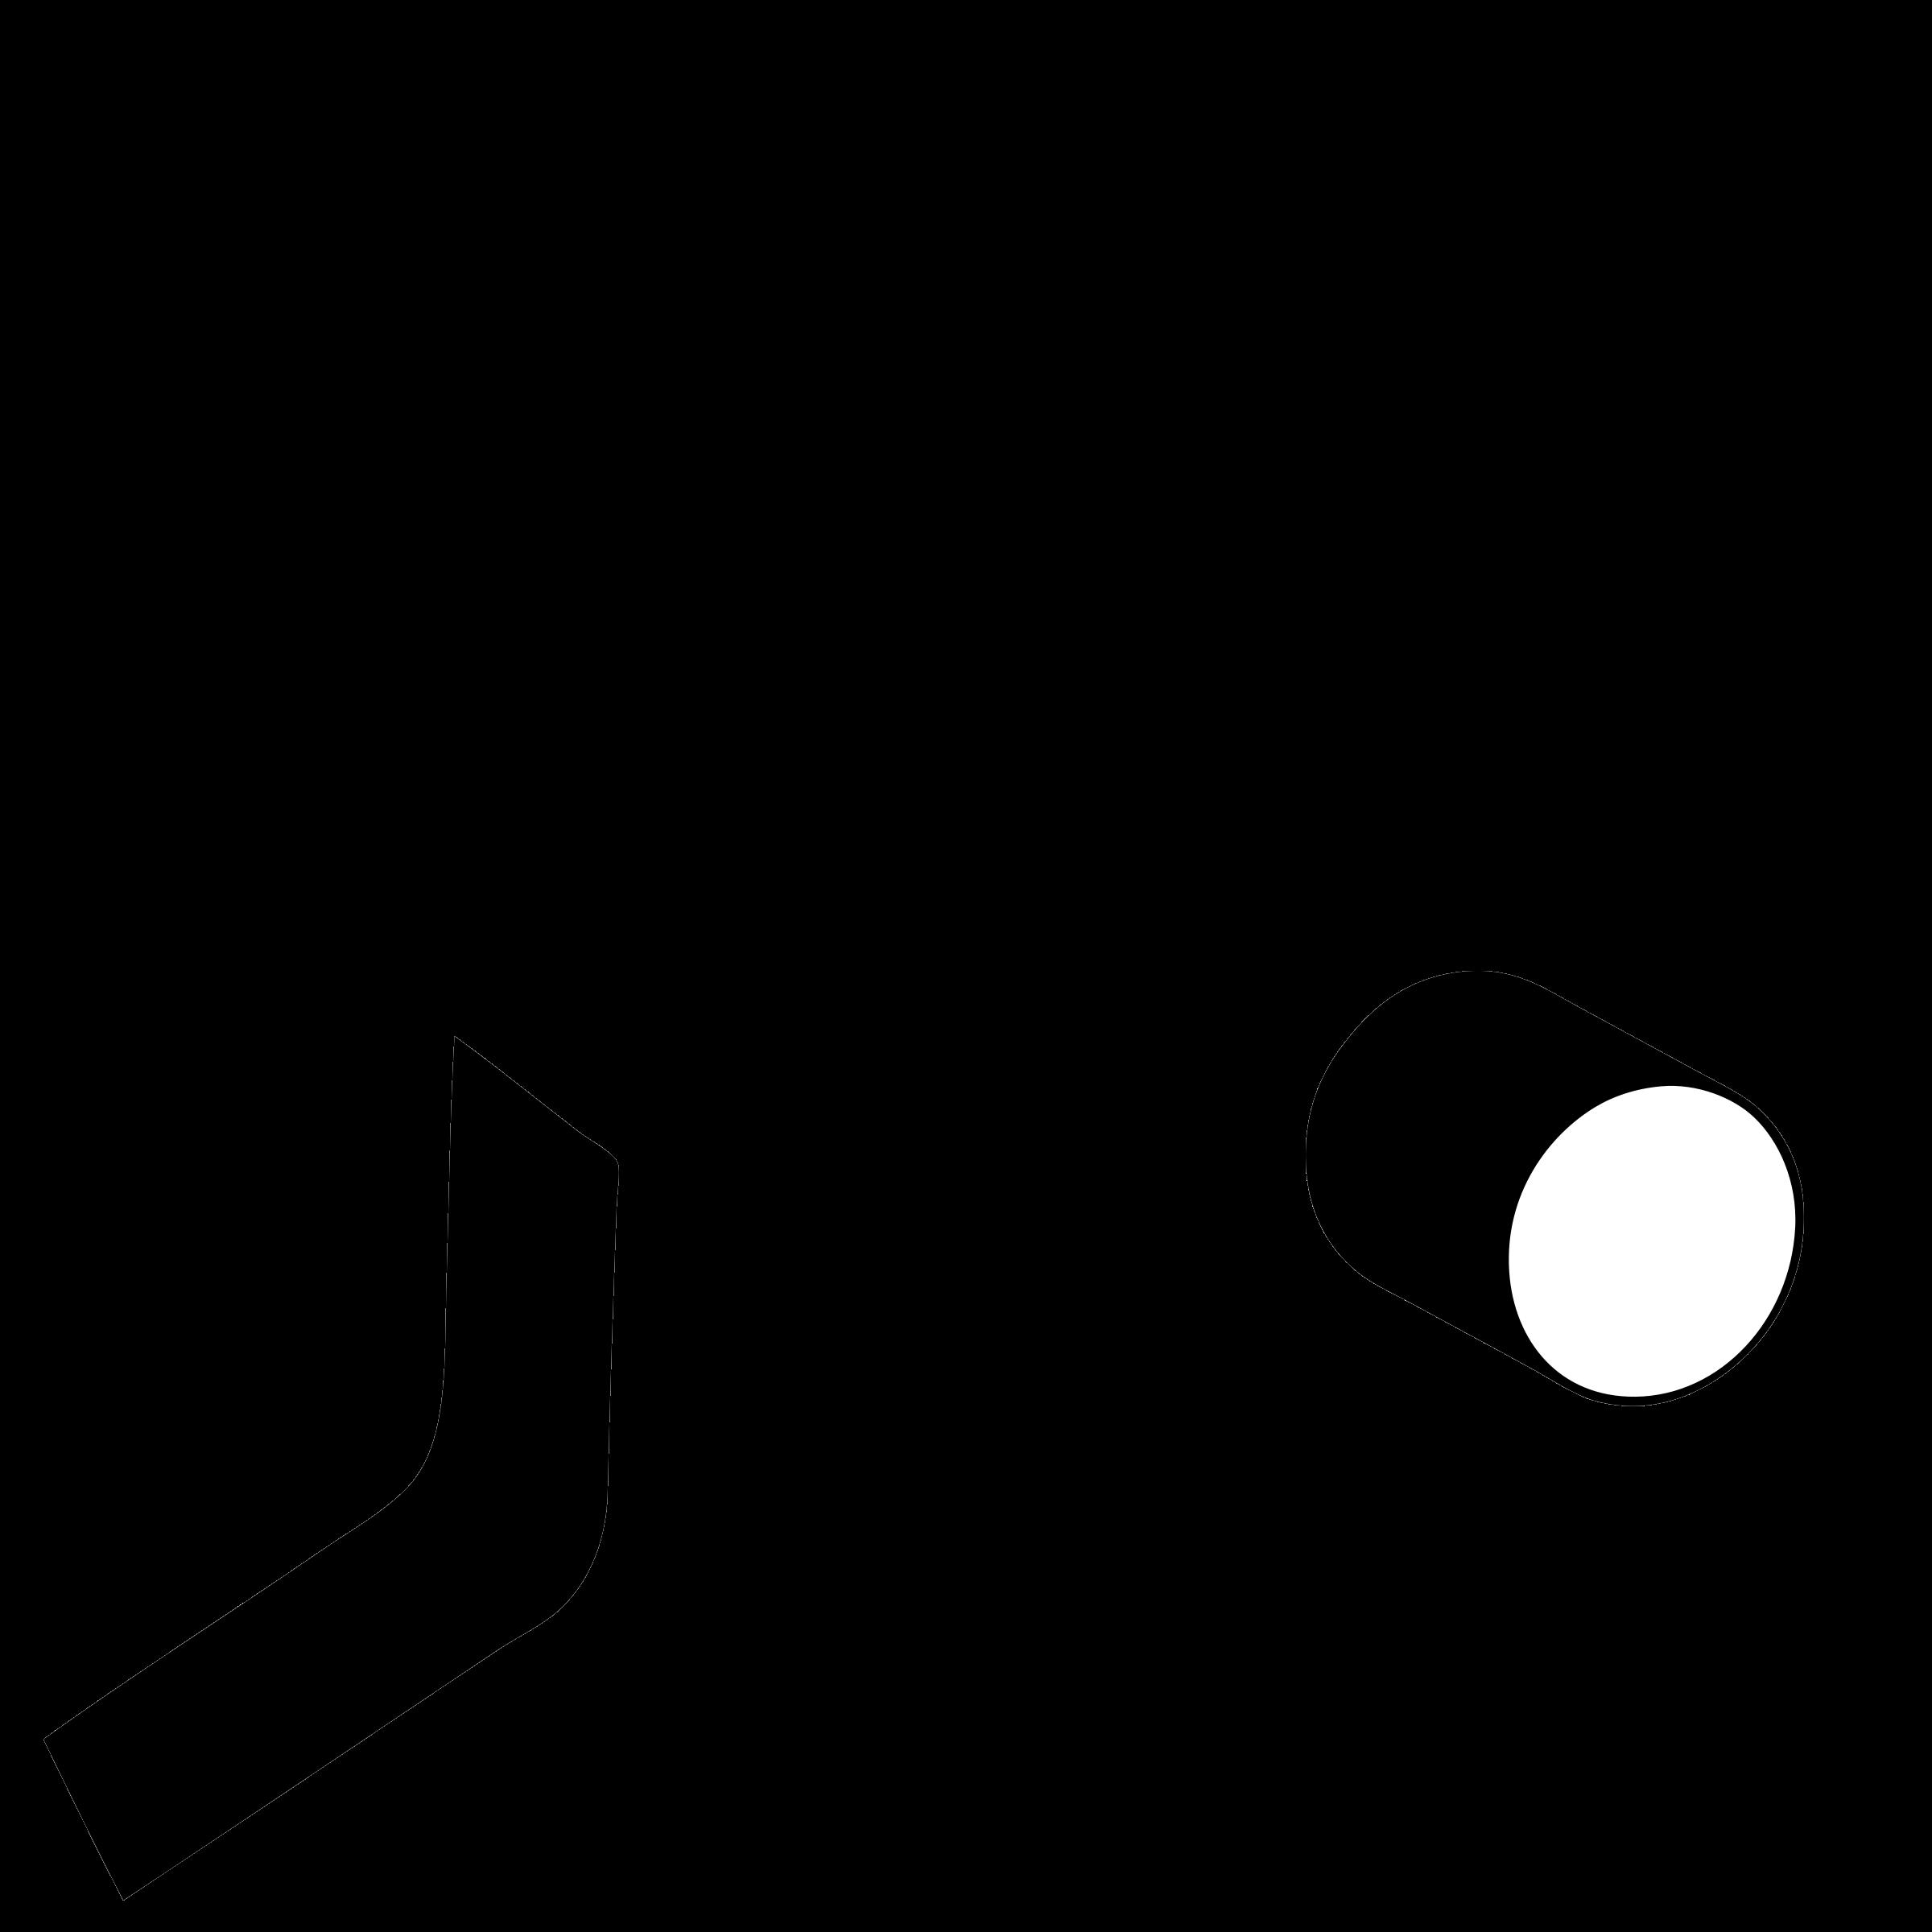 video camera logo clipart - photo #4